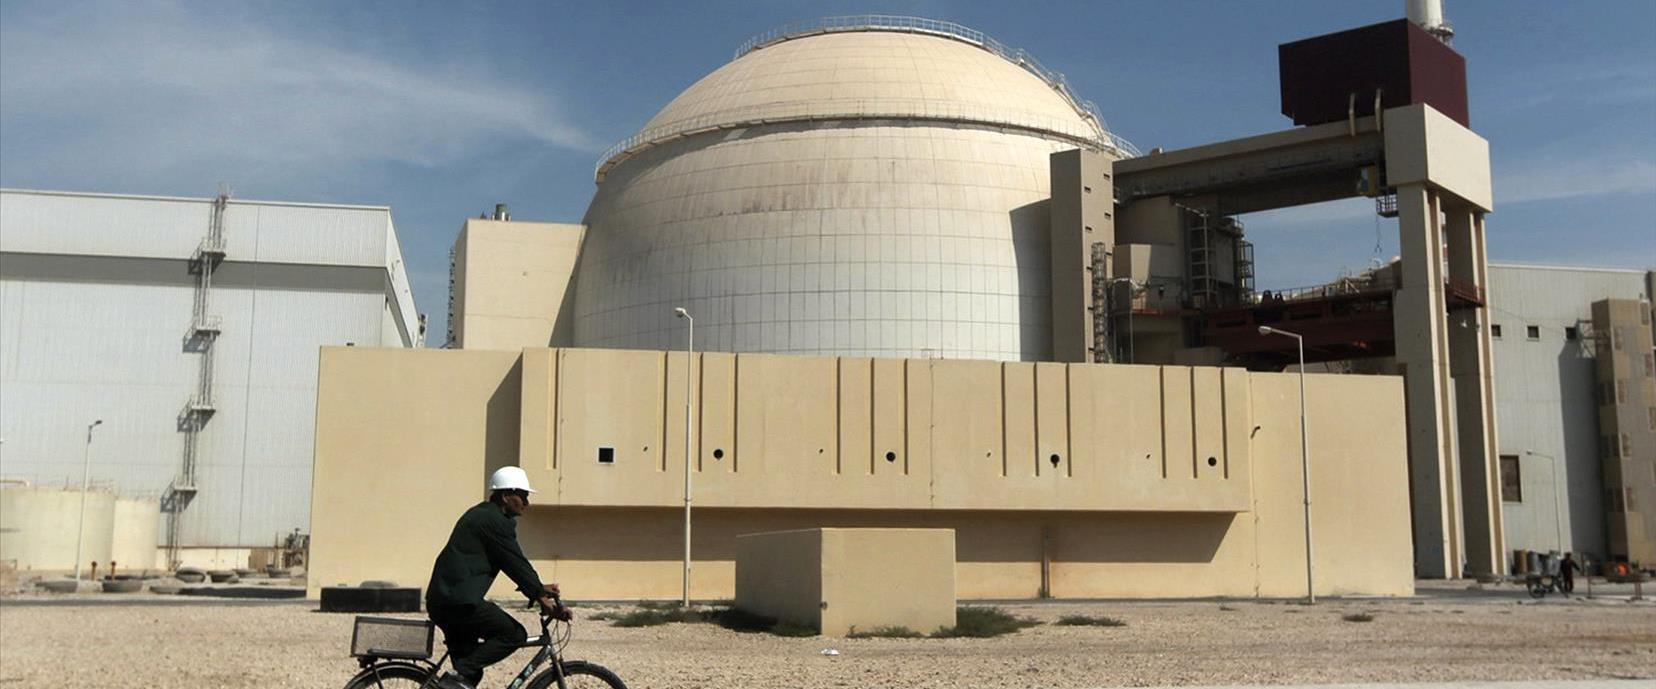 מתקן גרעין איראני